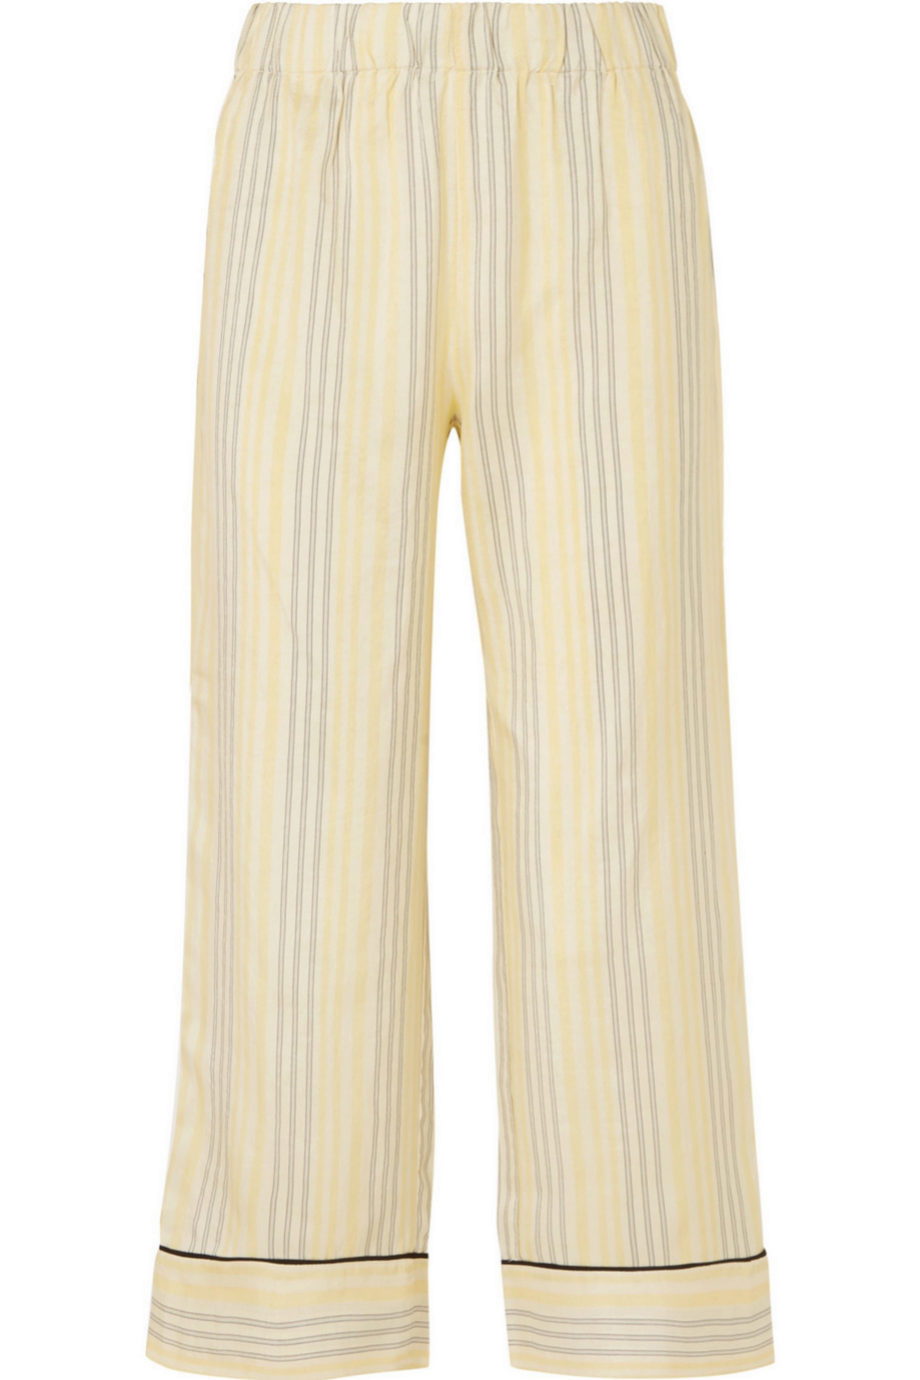 Pantalones de rayas tipo pijama de Ganni